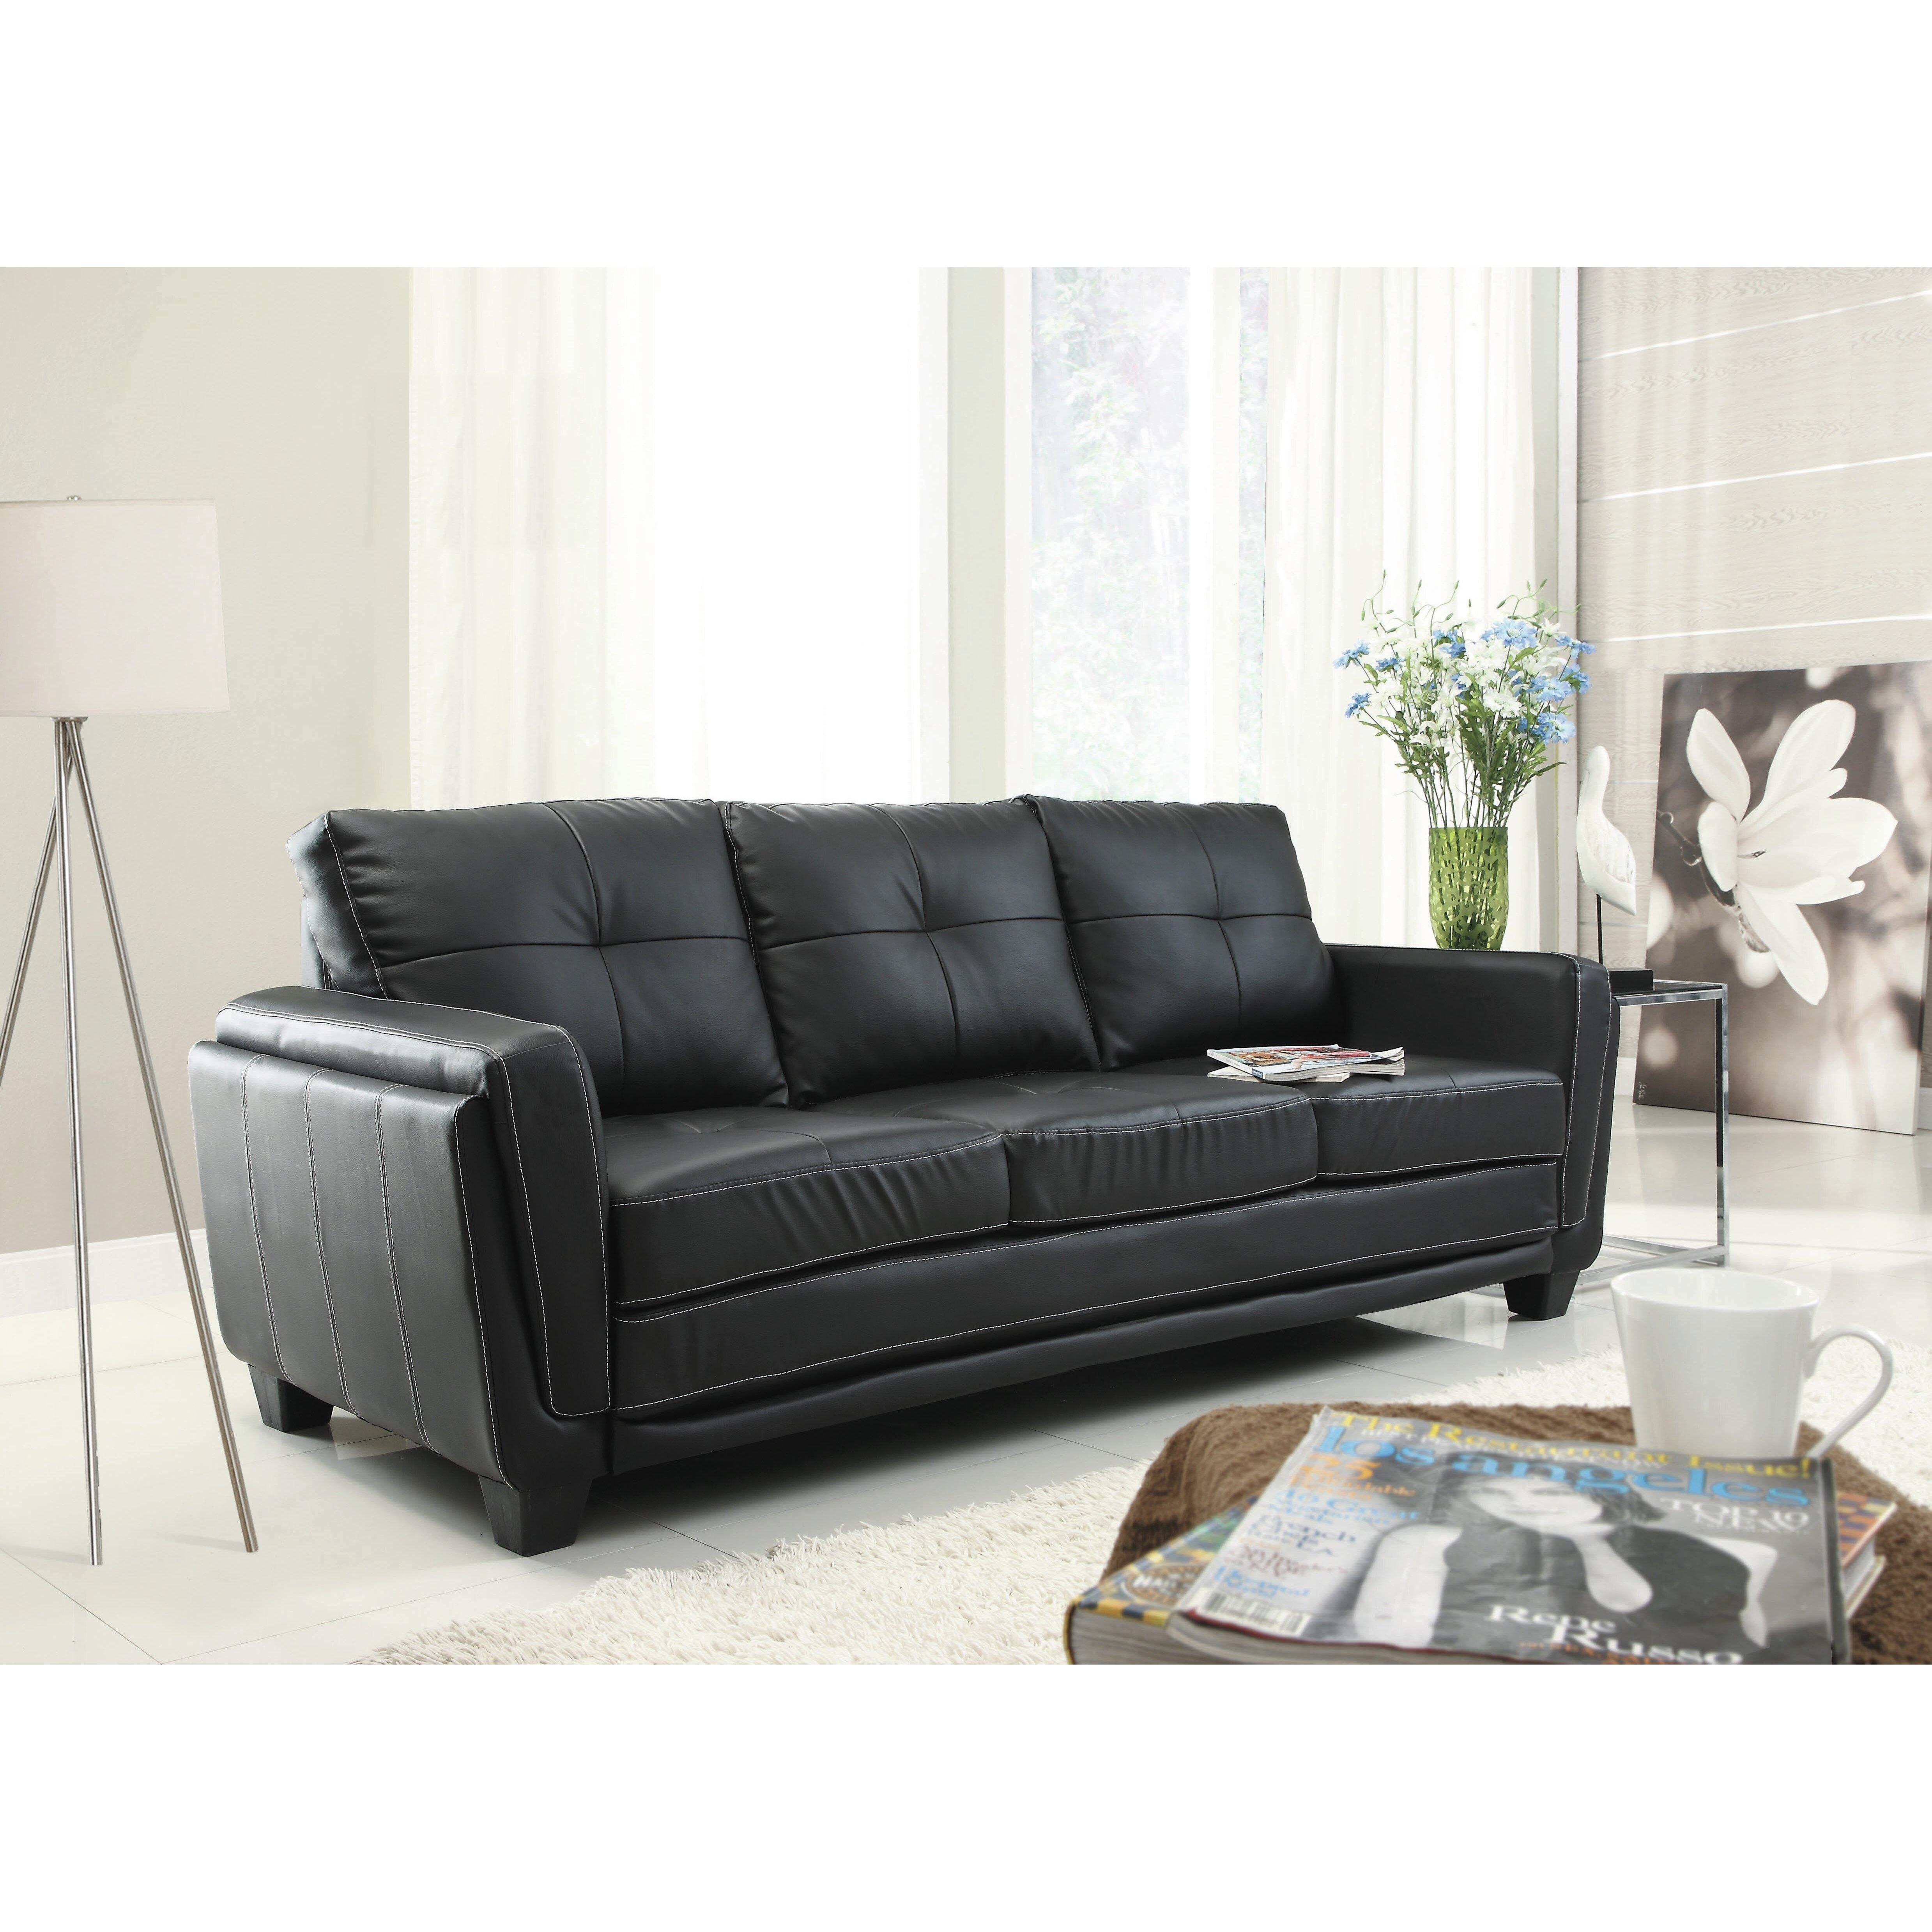 bellanest leather sofa Sofa Hpricot